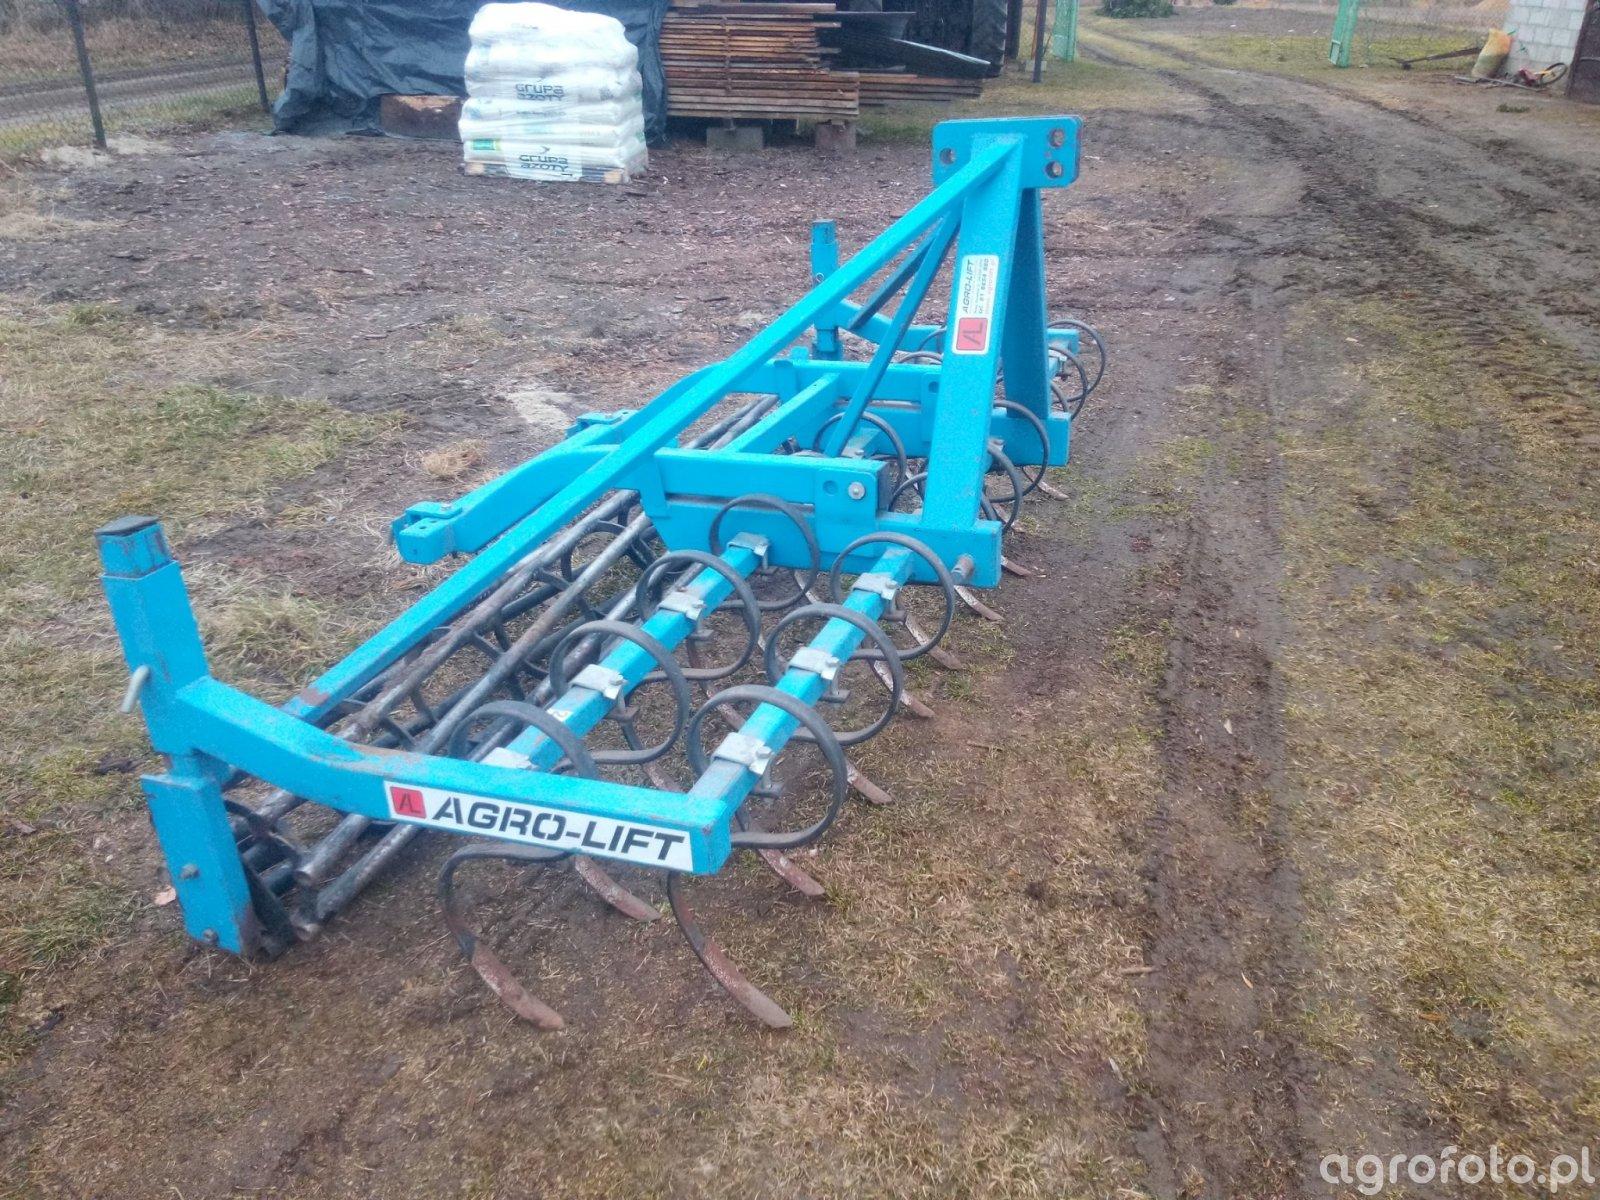 Agro-lift